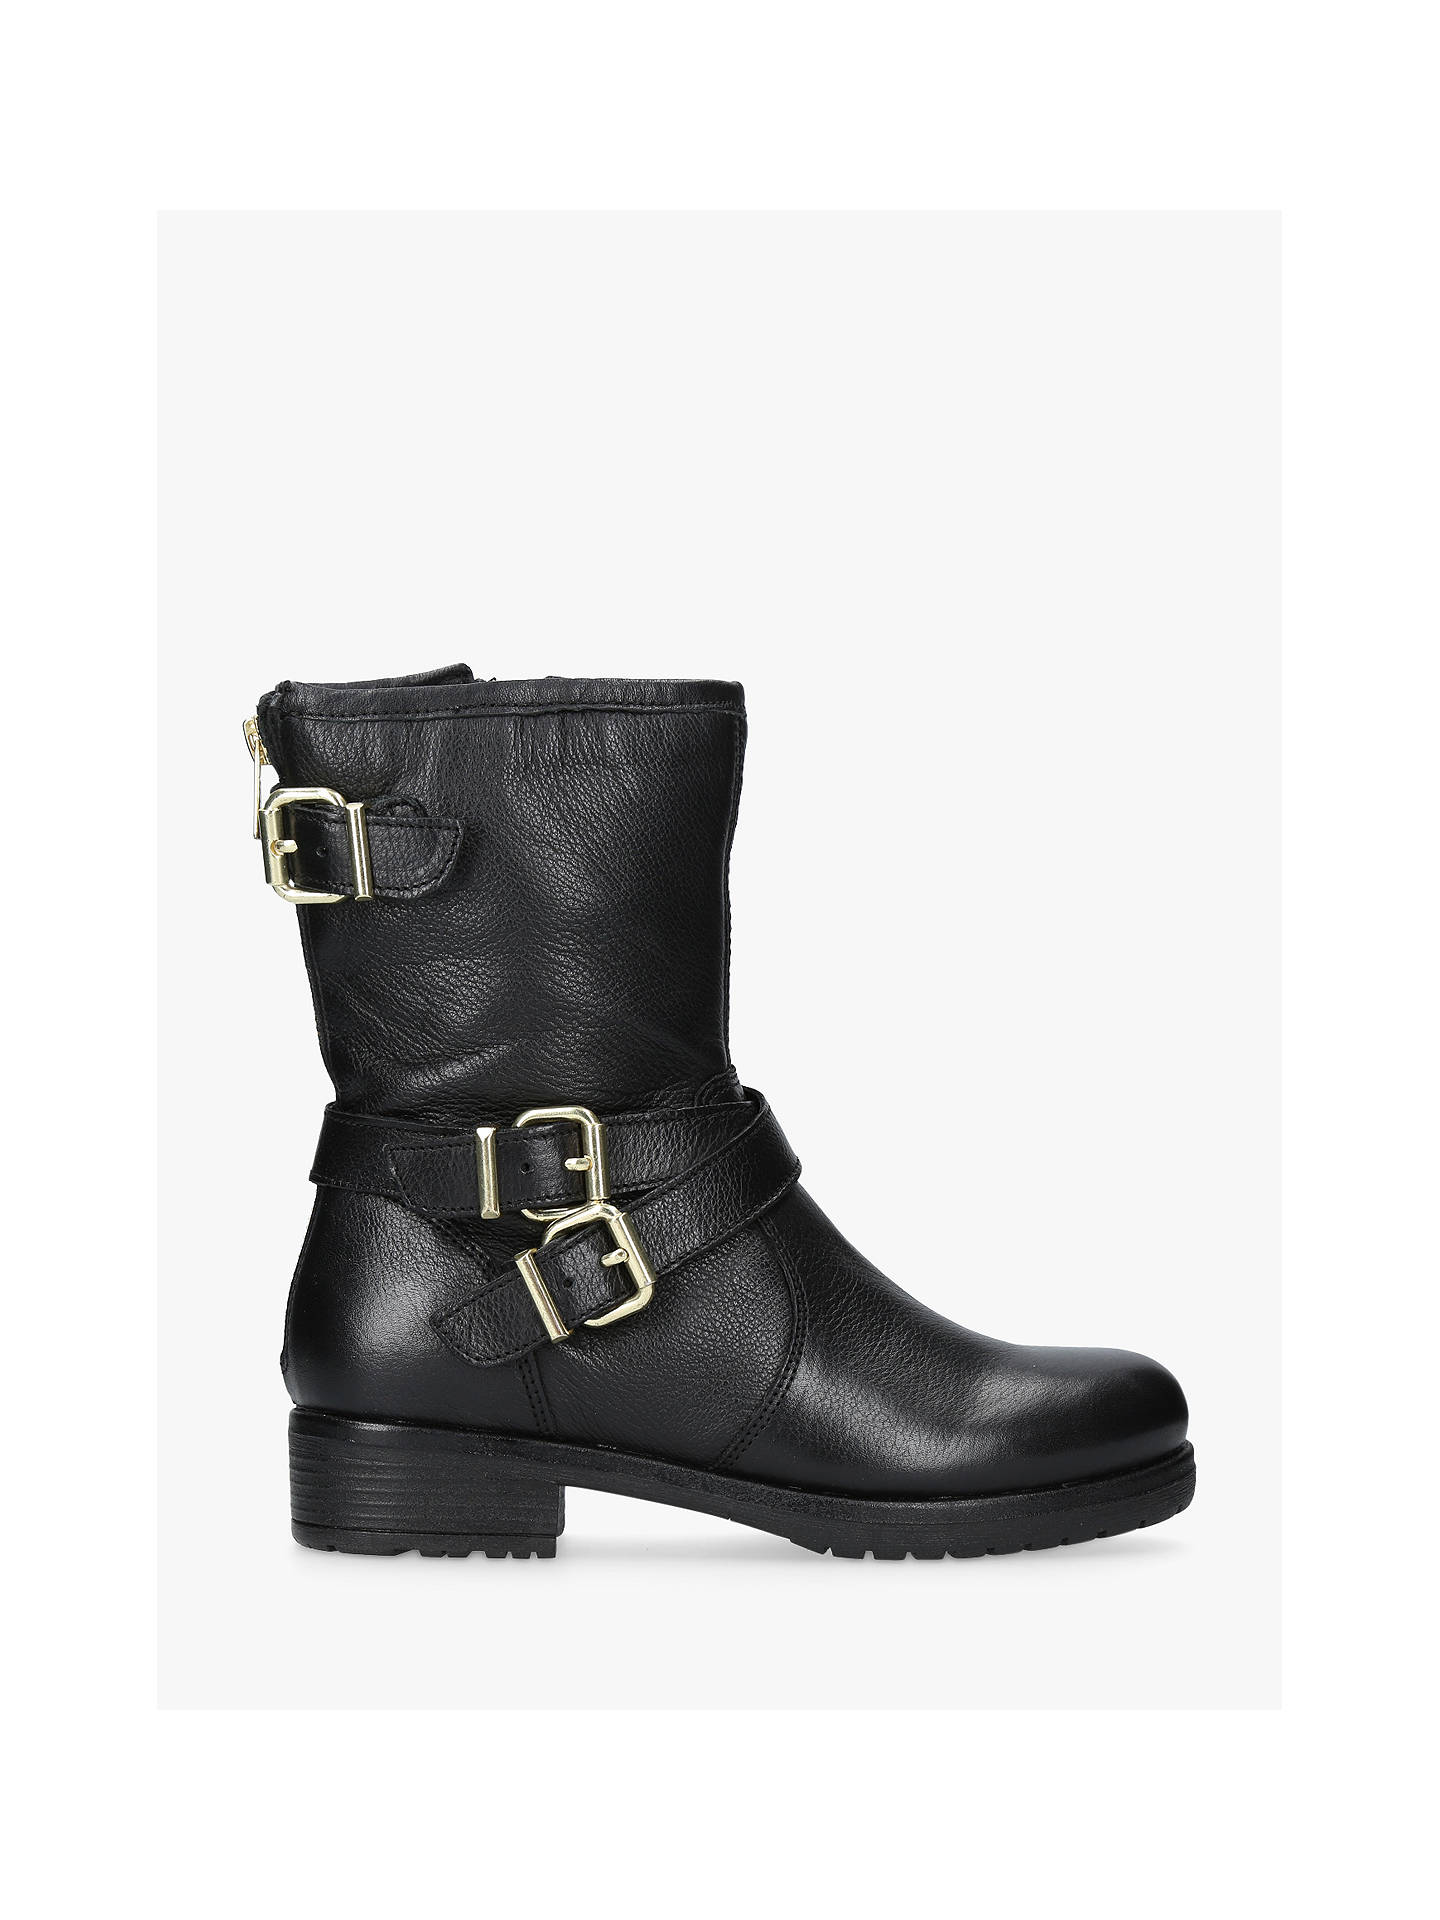 f7aa82331a Buy Carvela Soulful Biker Calf Boots, Black Leather, 3 Online at  johnlewis.com ...